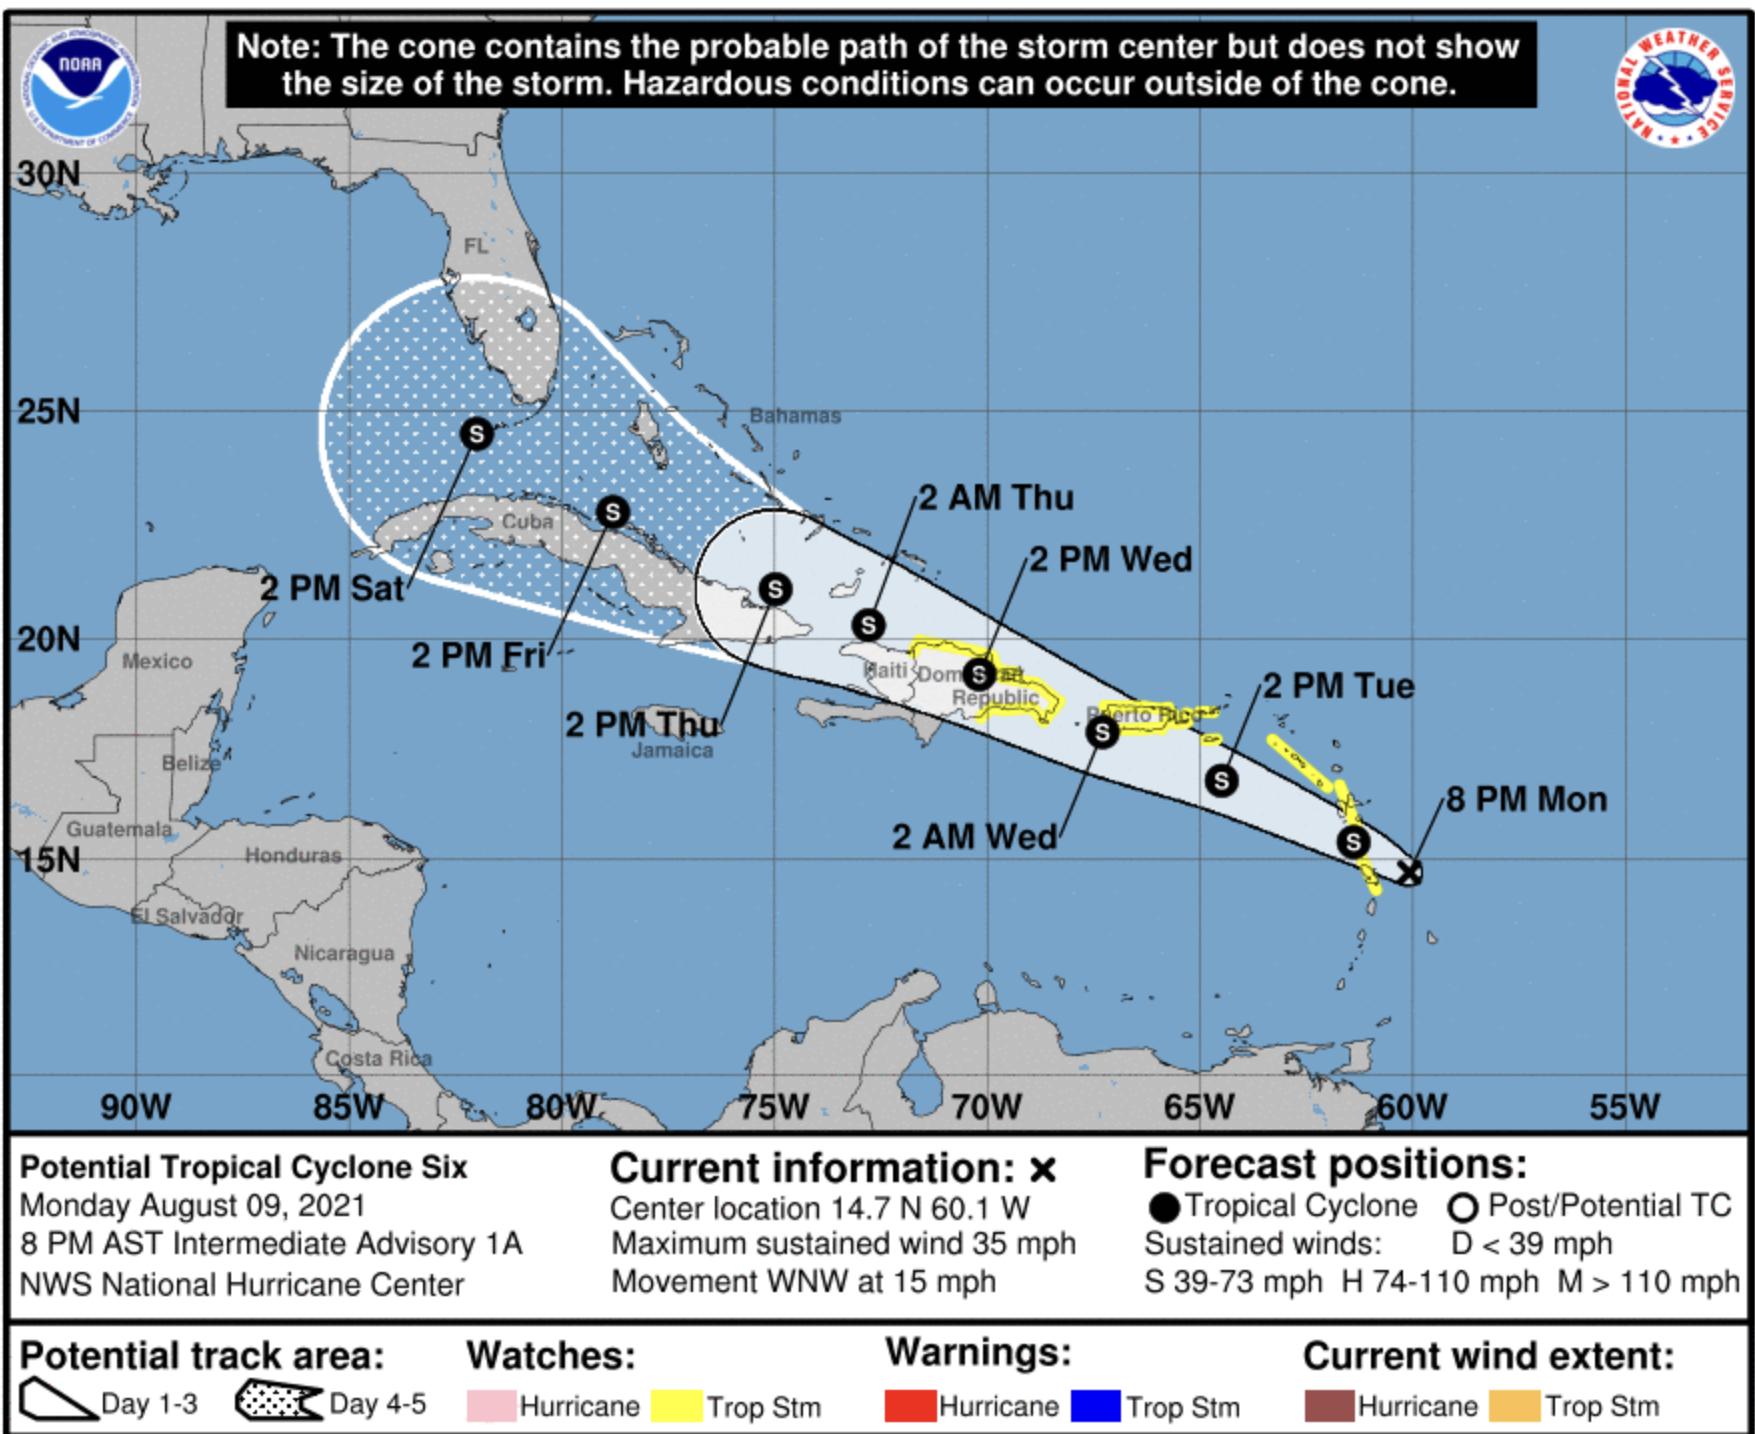 NHC Tropical Storm Florida